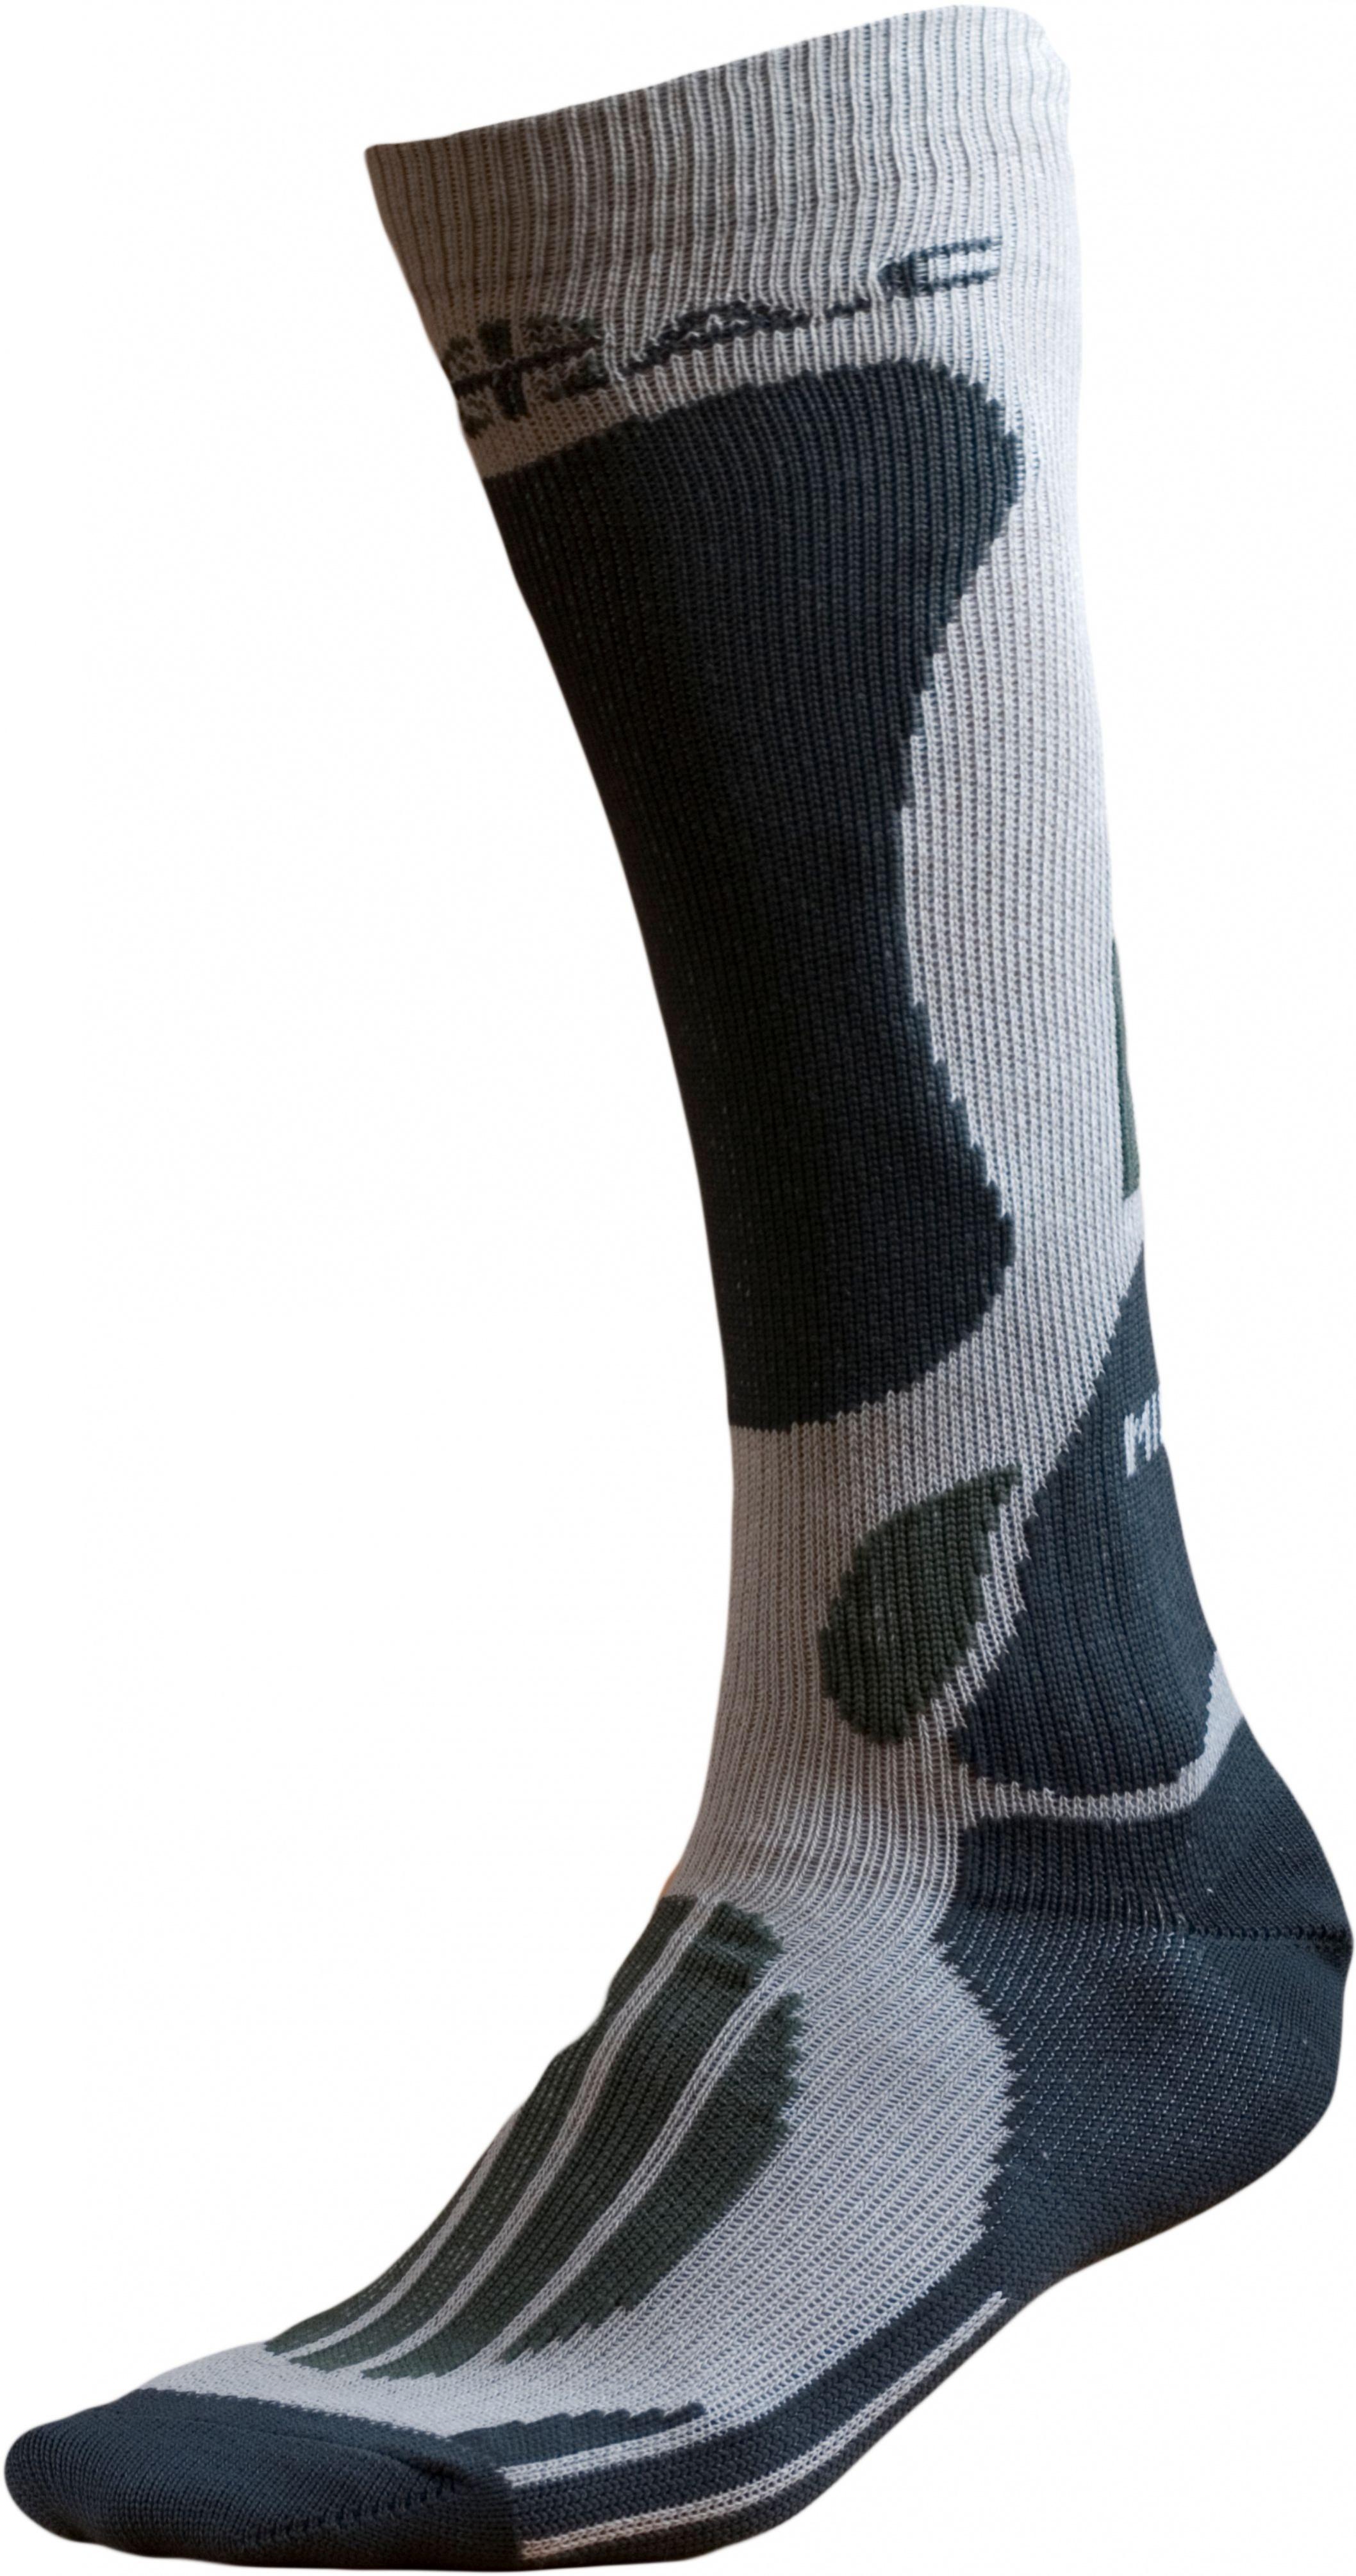 Ponožky BATAC Mission MI13 vel. 34-35 - green